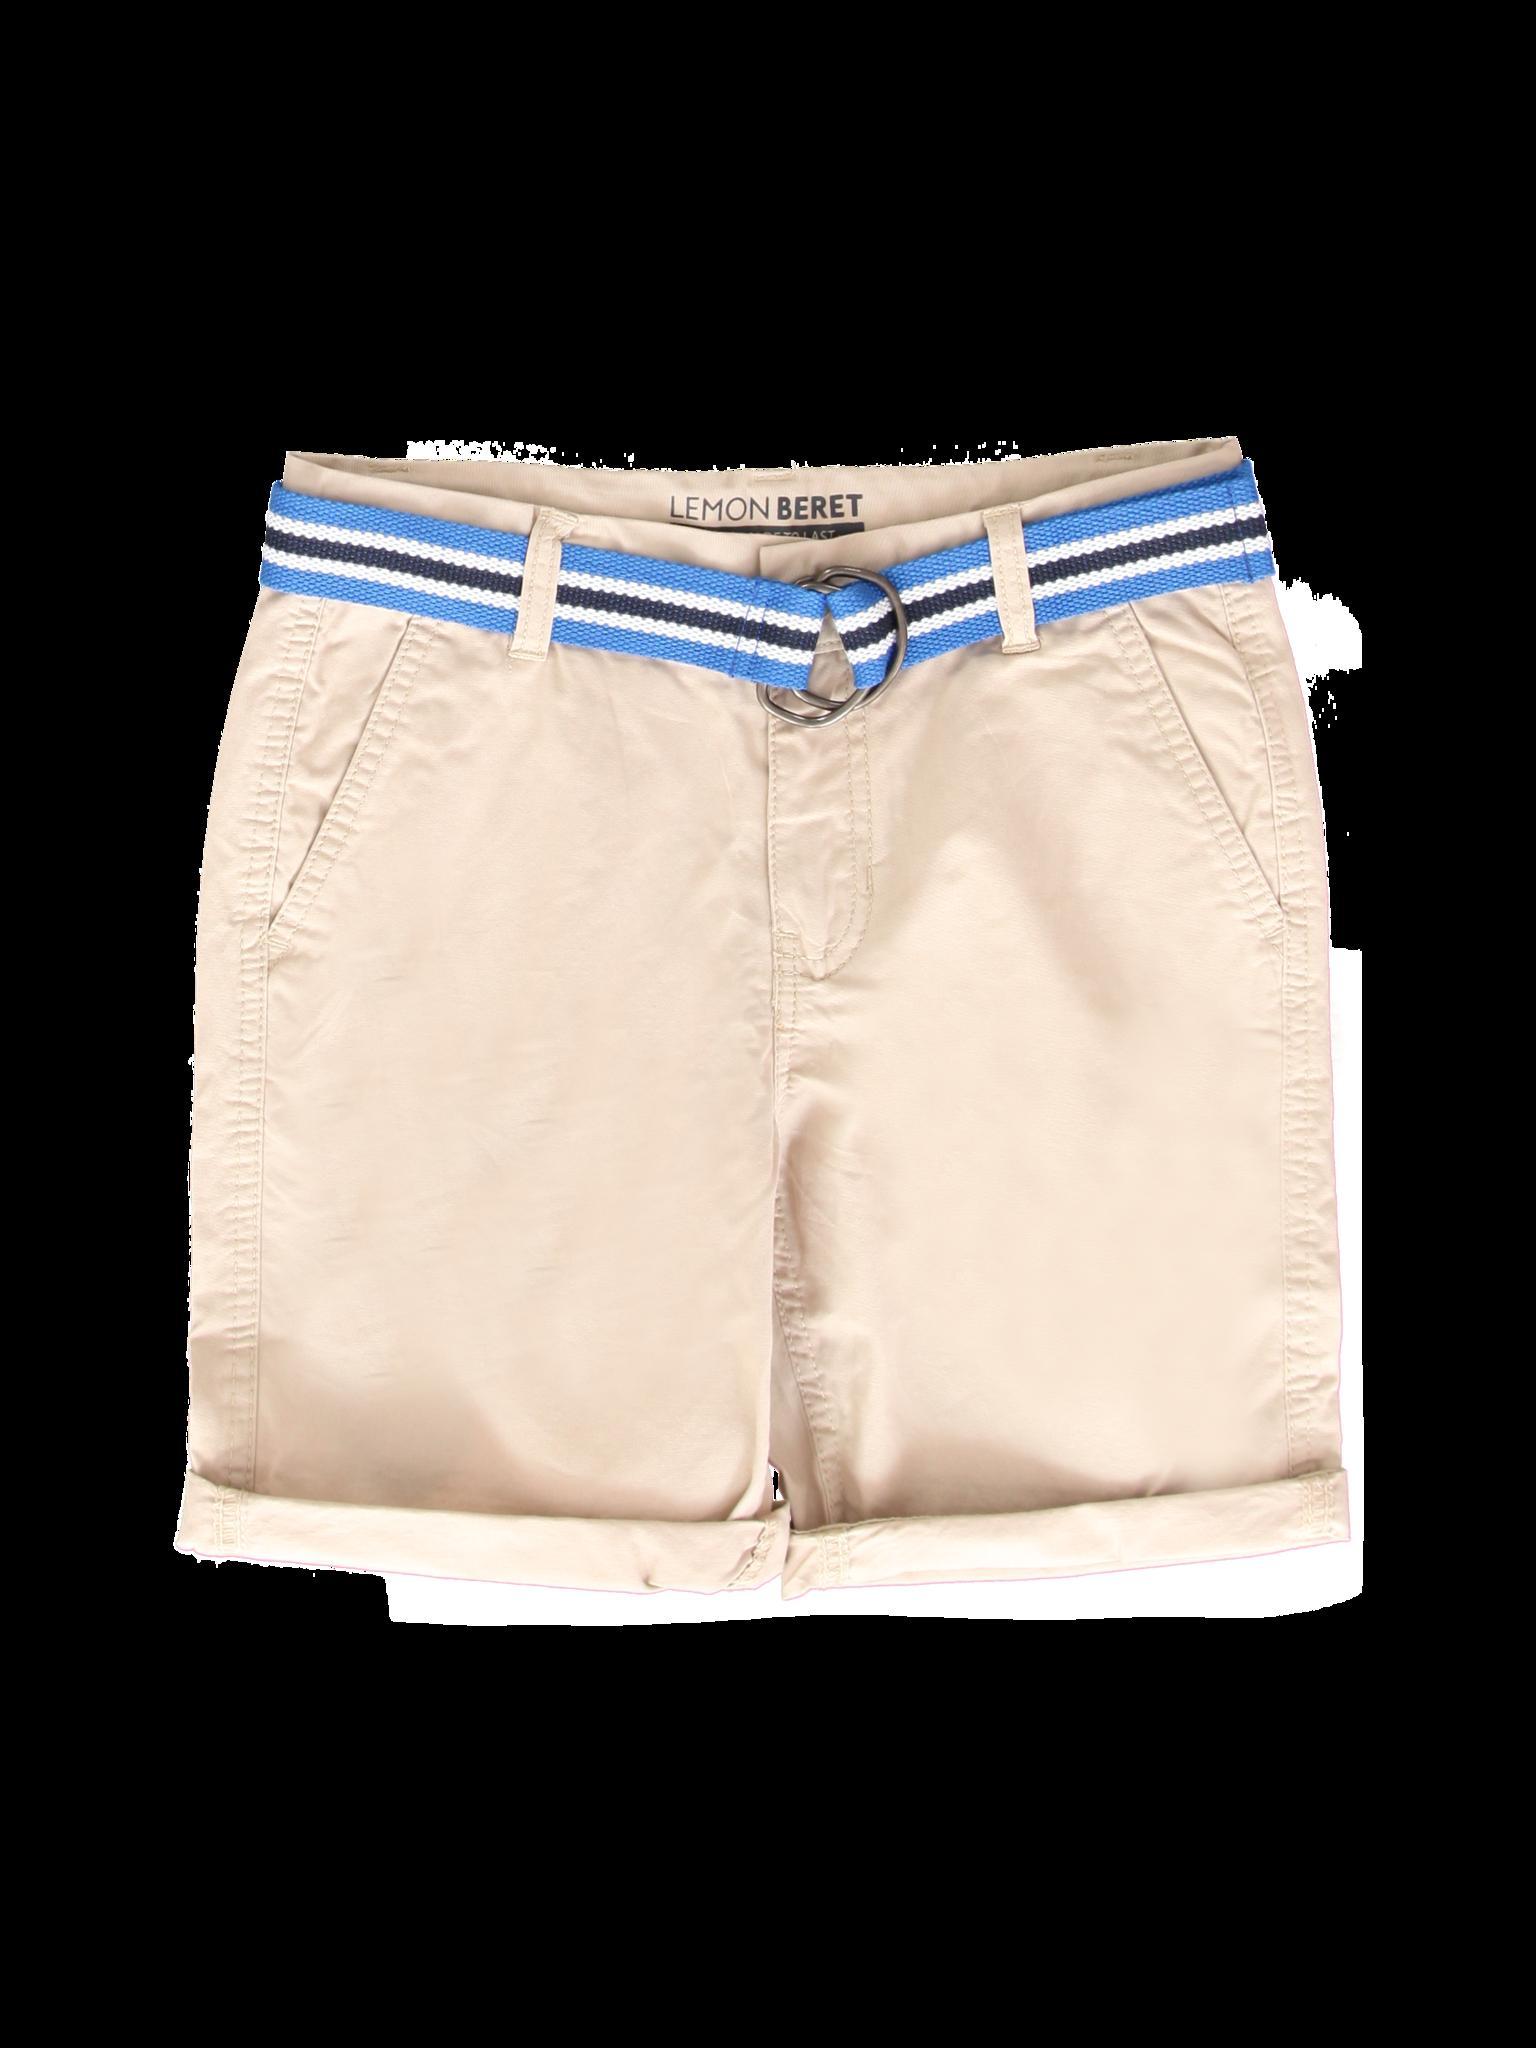 All Brands | Summerproducts Teen Boys | Bermuda | 10 pcs/box